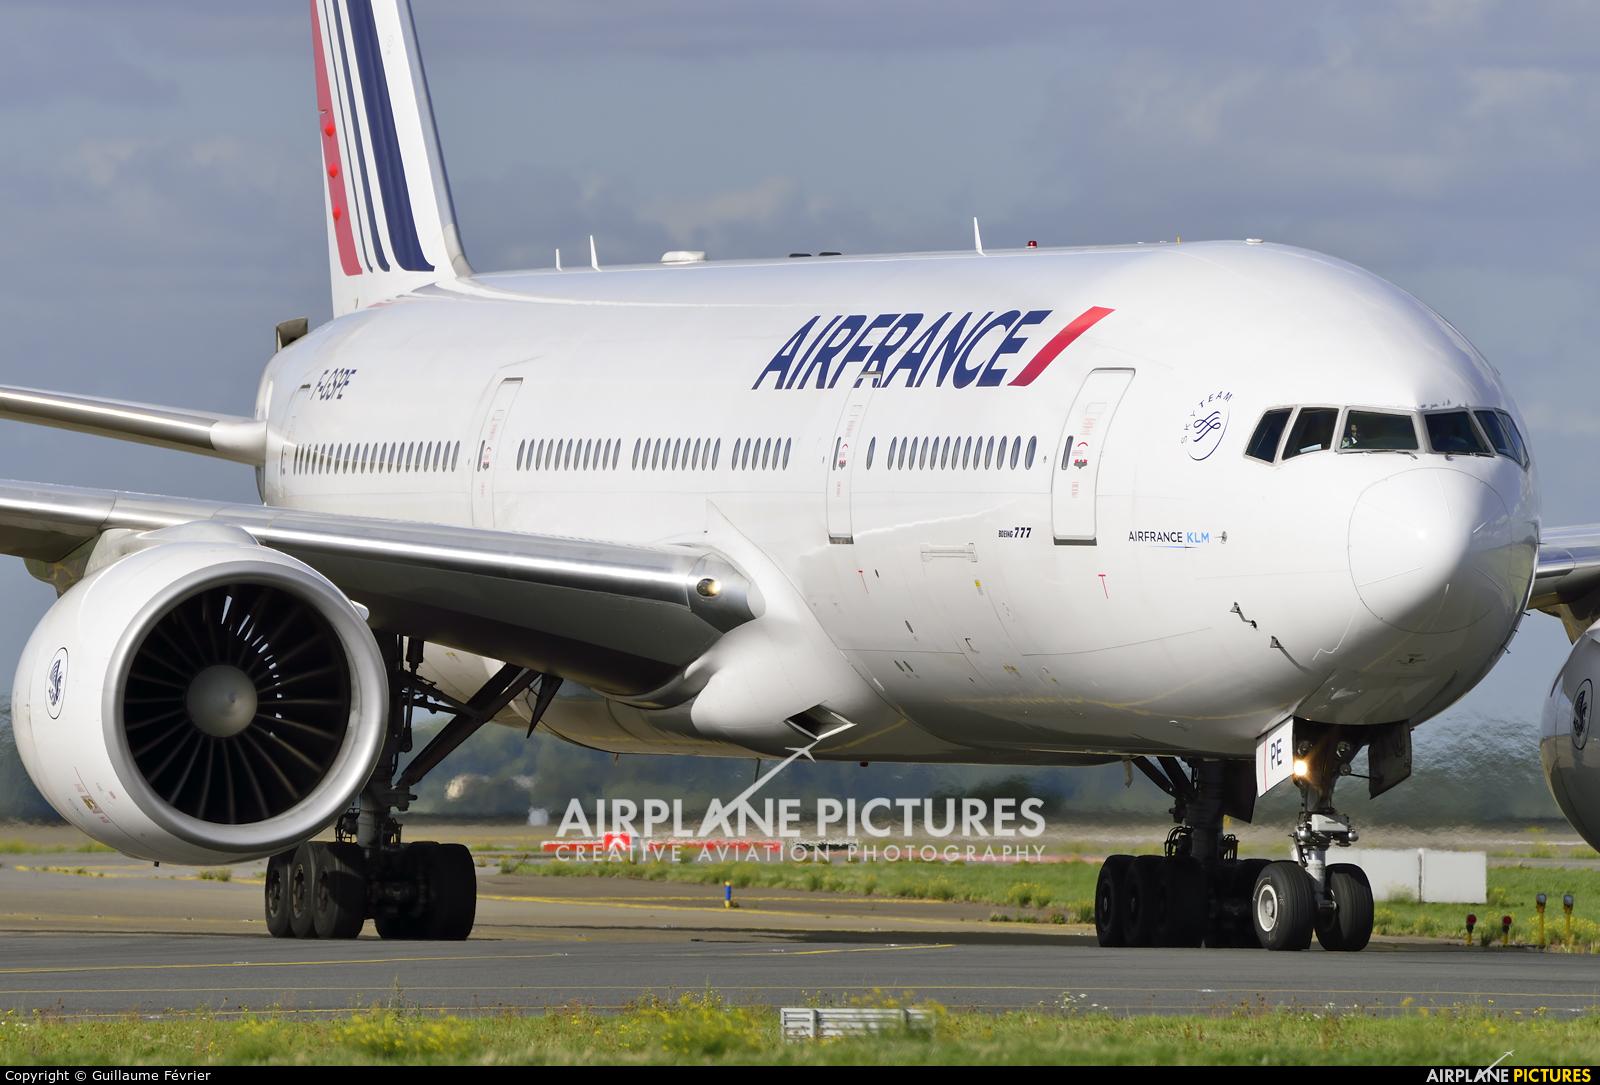 Air France F-GSPE aircraft at Paris - Charles de Gaulle